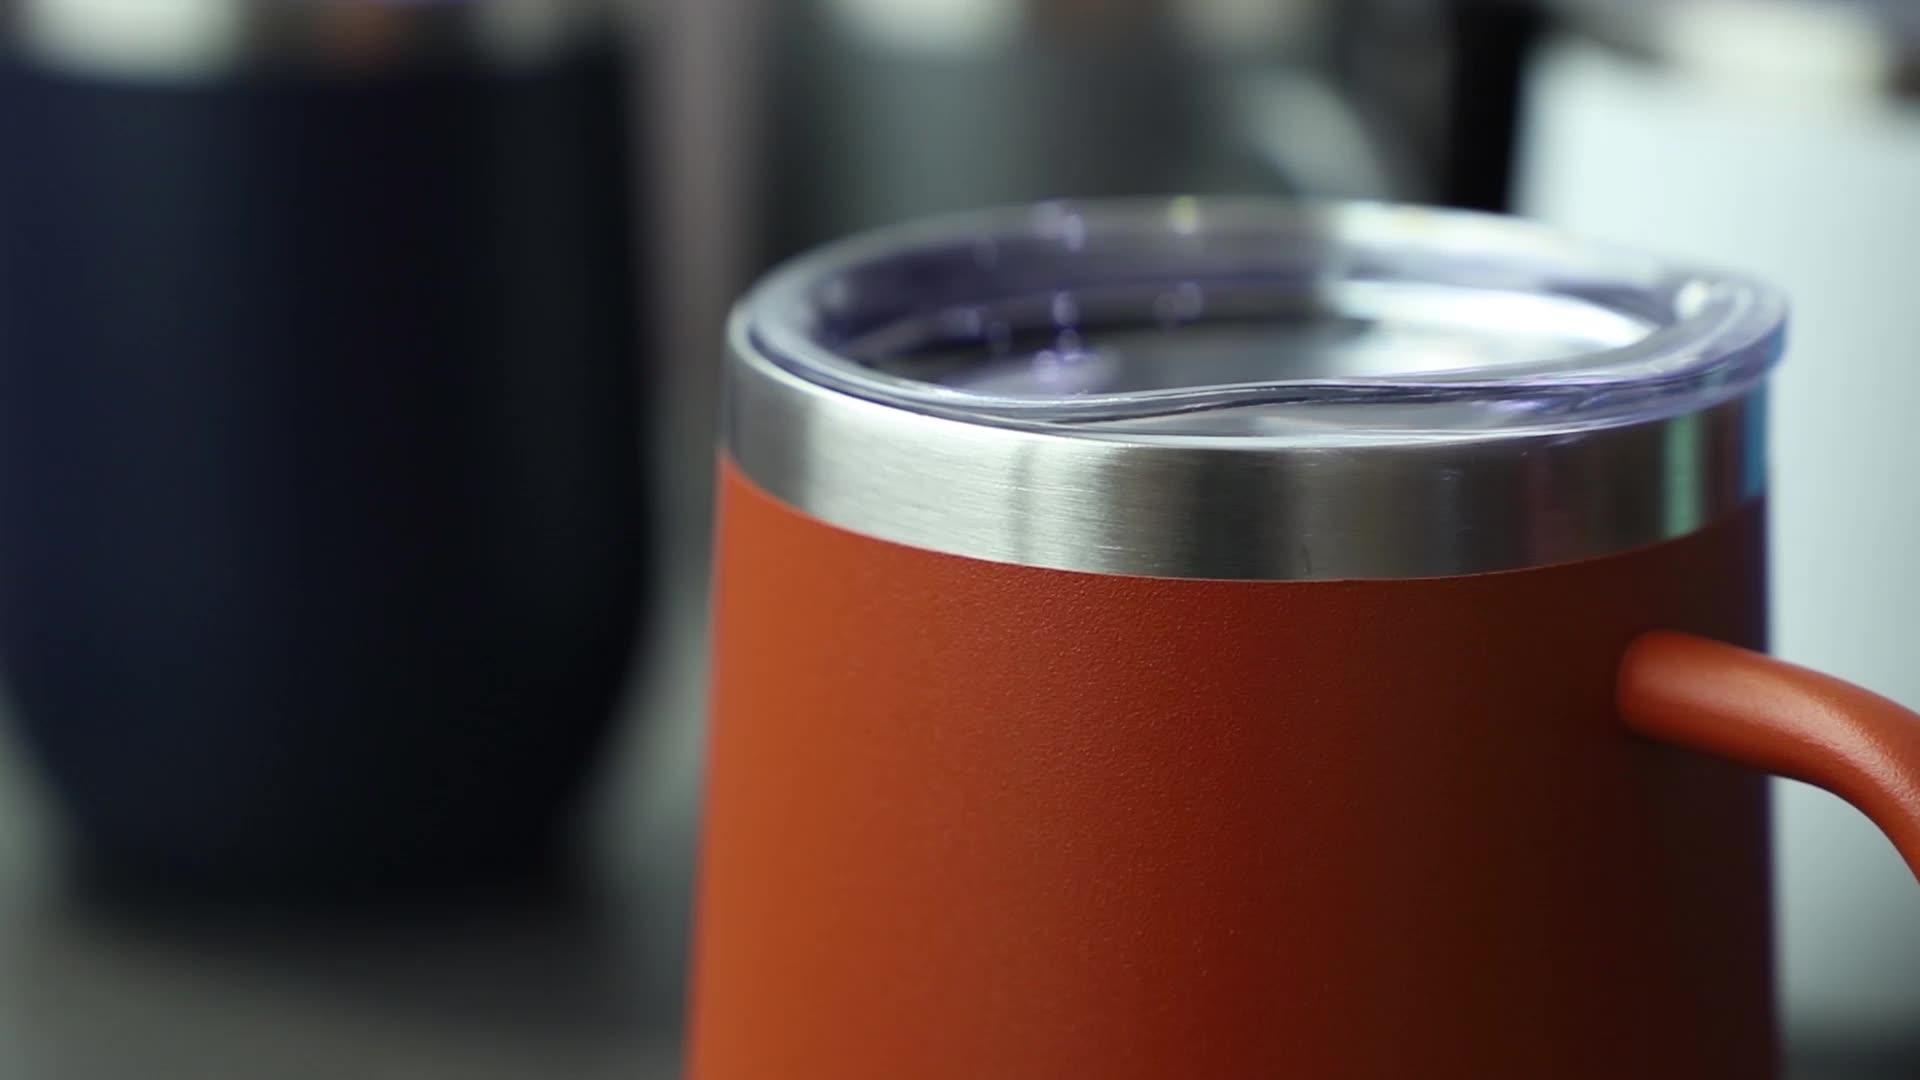 12 Oz Tanpa Tangkai Anggur Kaca Tumbler dengan Tutup Stainless Steel Double Wall Vacuum Insulated Perjalanan Piala